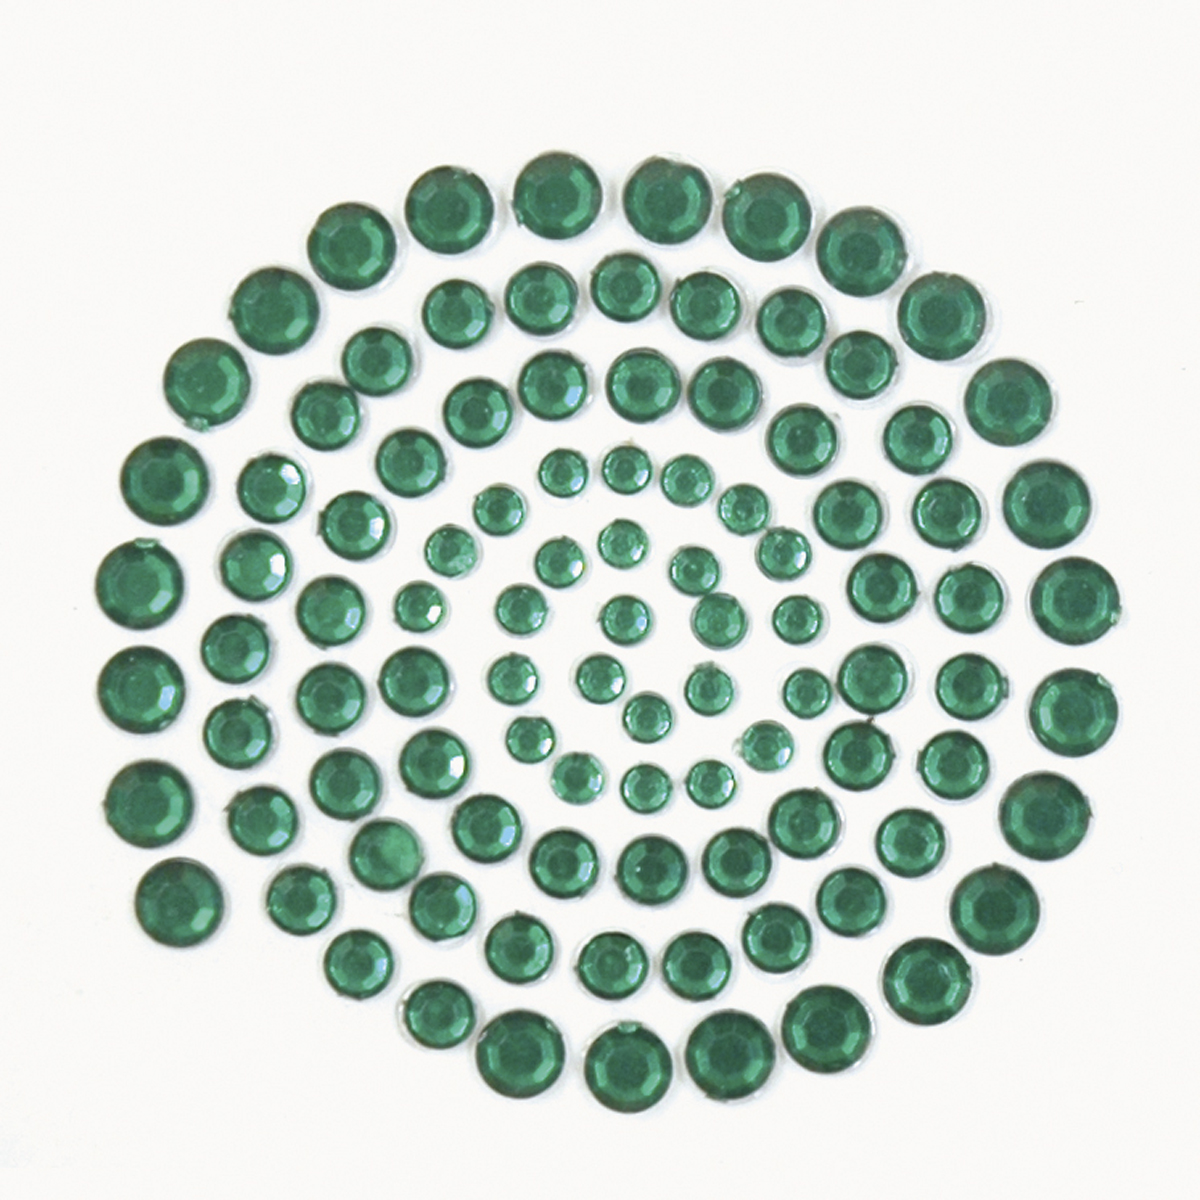 Kaisercraft Adhesive Rhinestones 100/Pkg-Dark Green